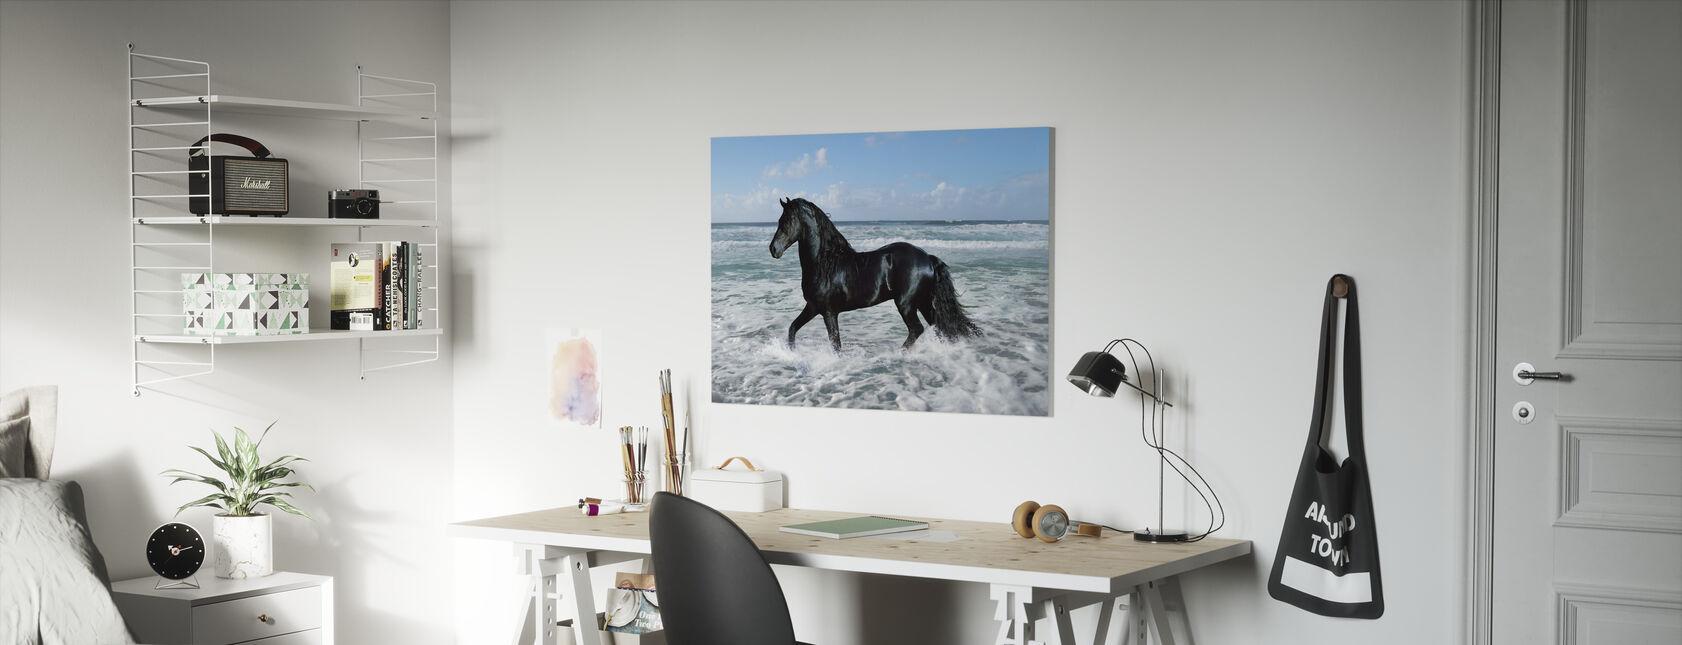 Hest Bading - Lerretsbilde - Barnerom